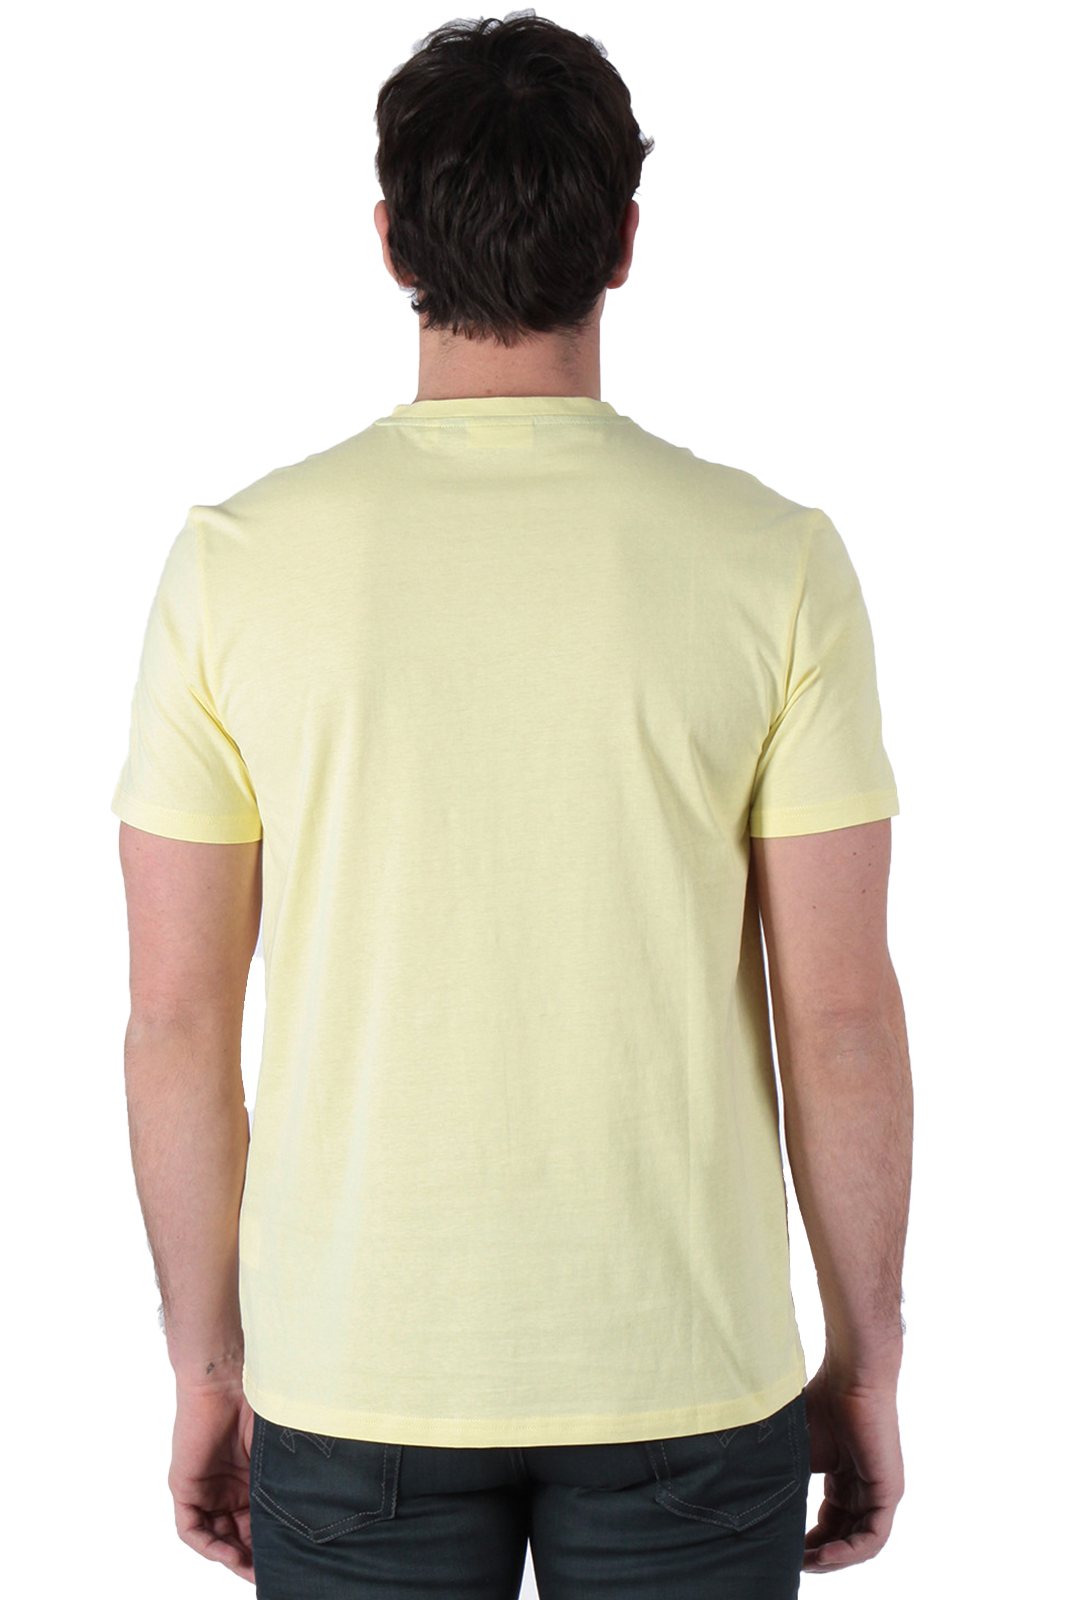 Tee-shirts  Kaporal PARC SUNNY